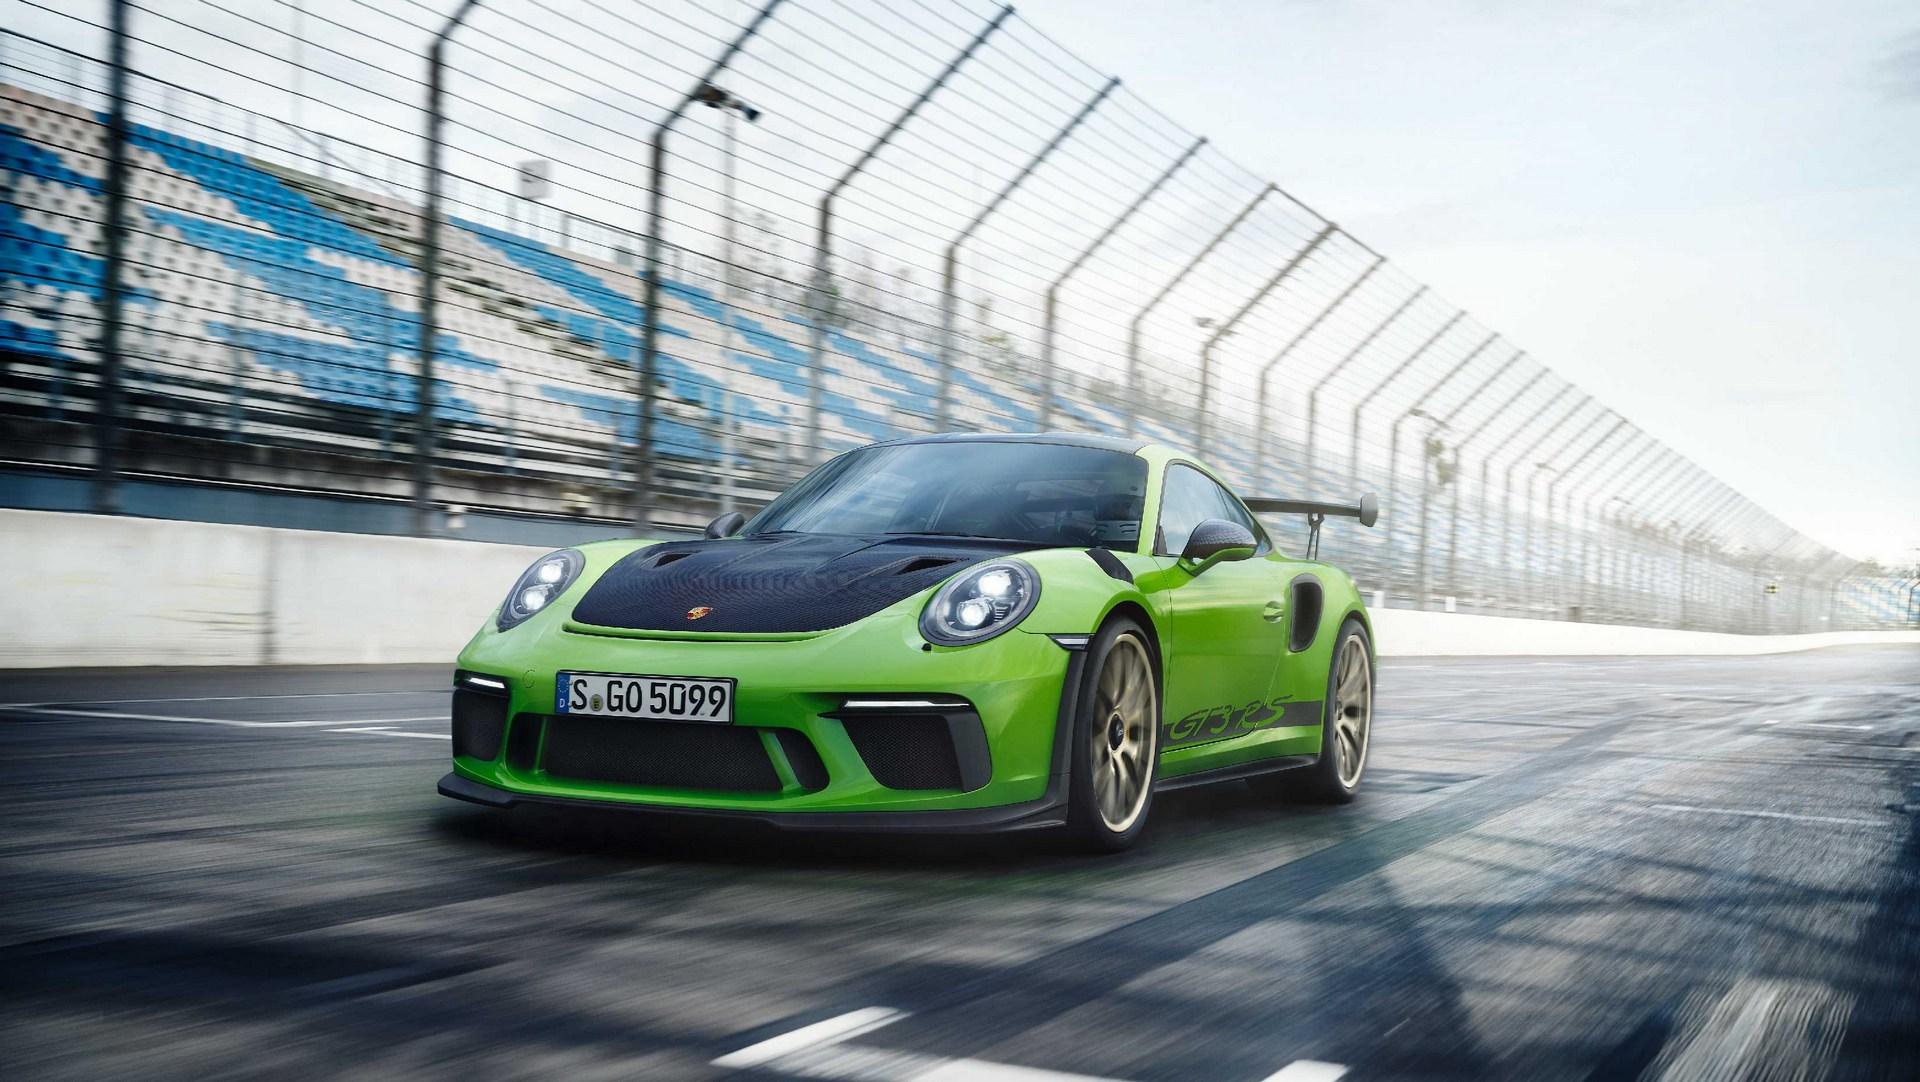 Porsche uveren da će i ove godine ostvariti rekordnu prodaju vozila